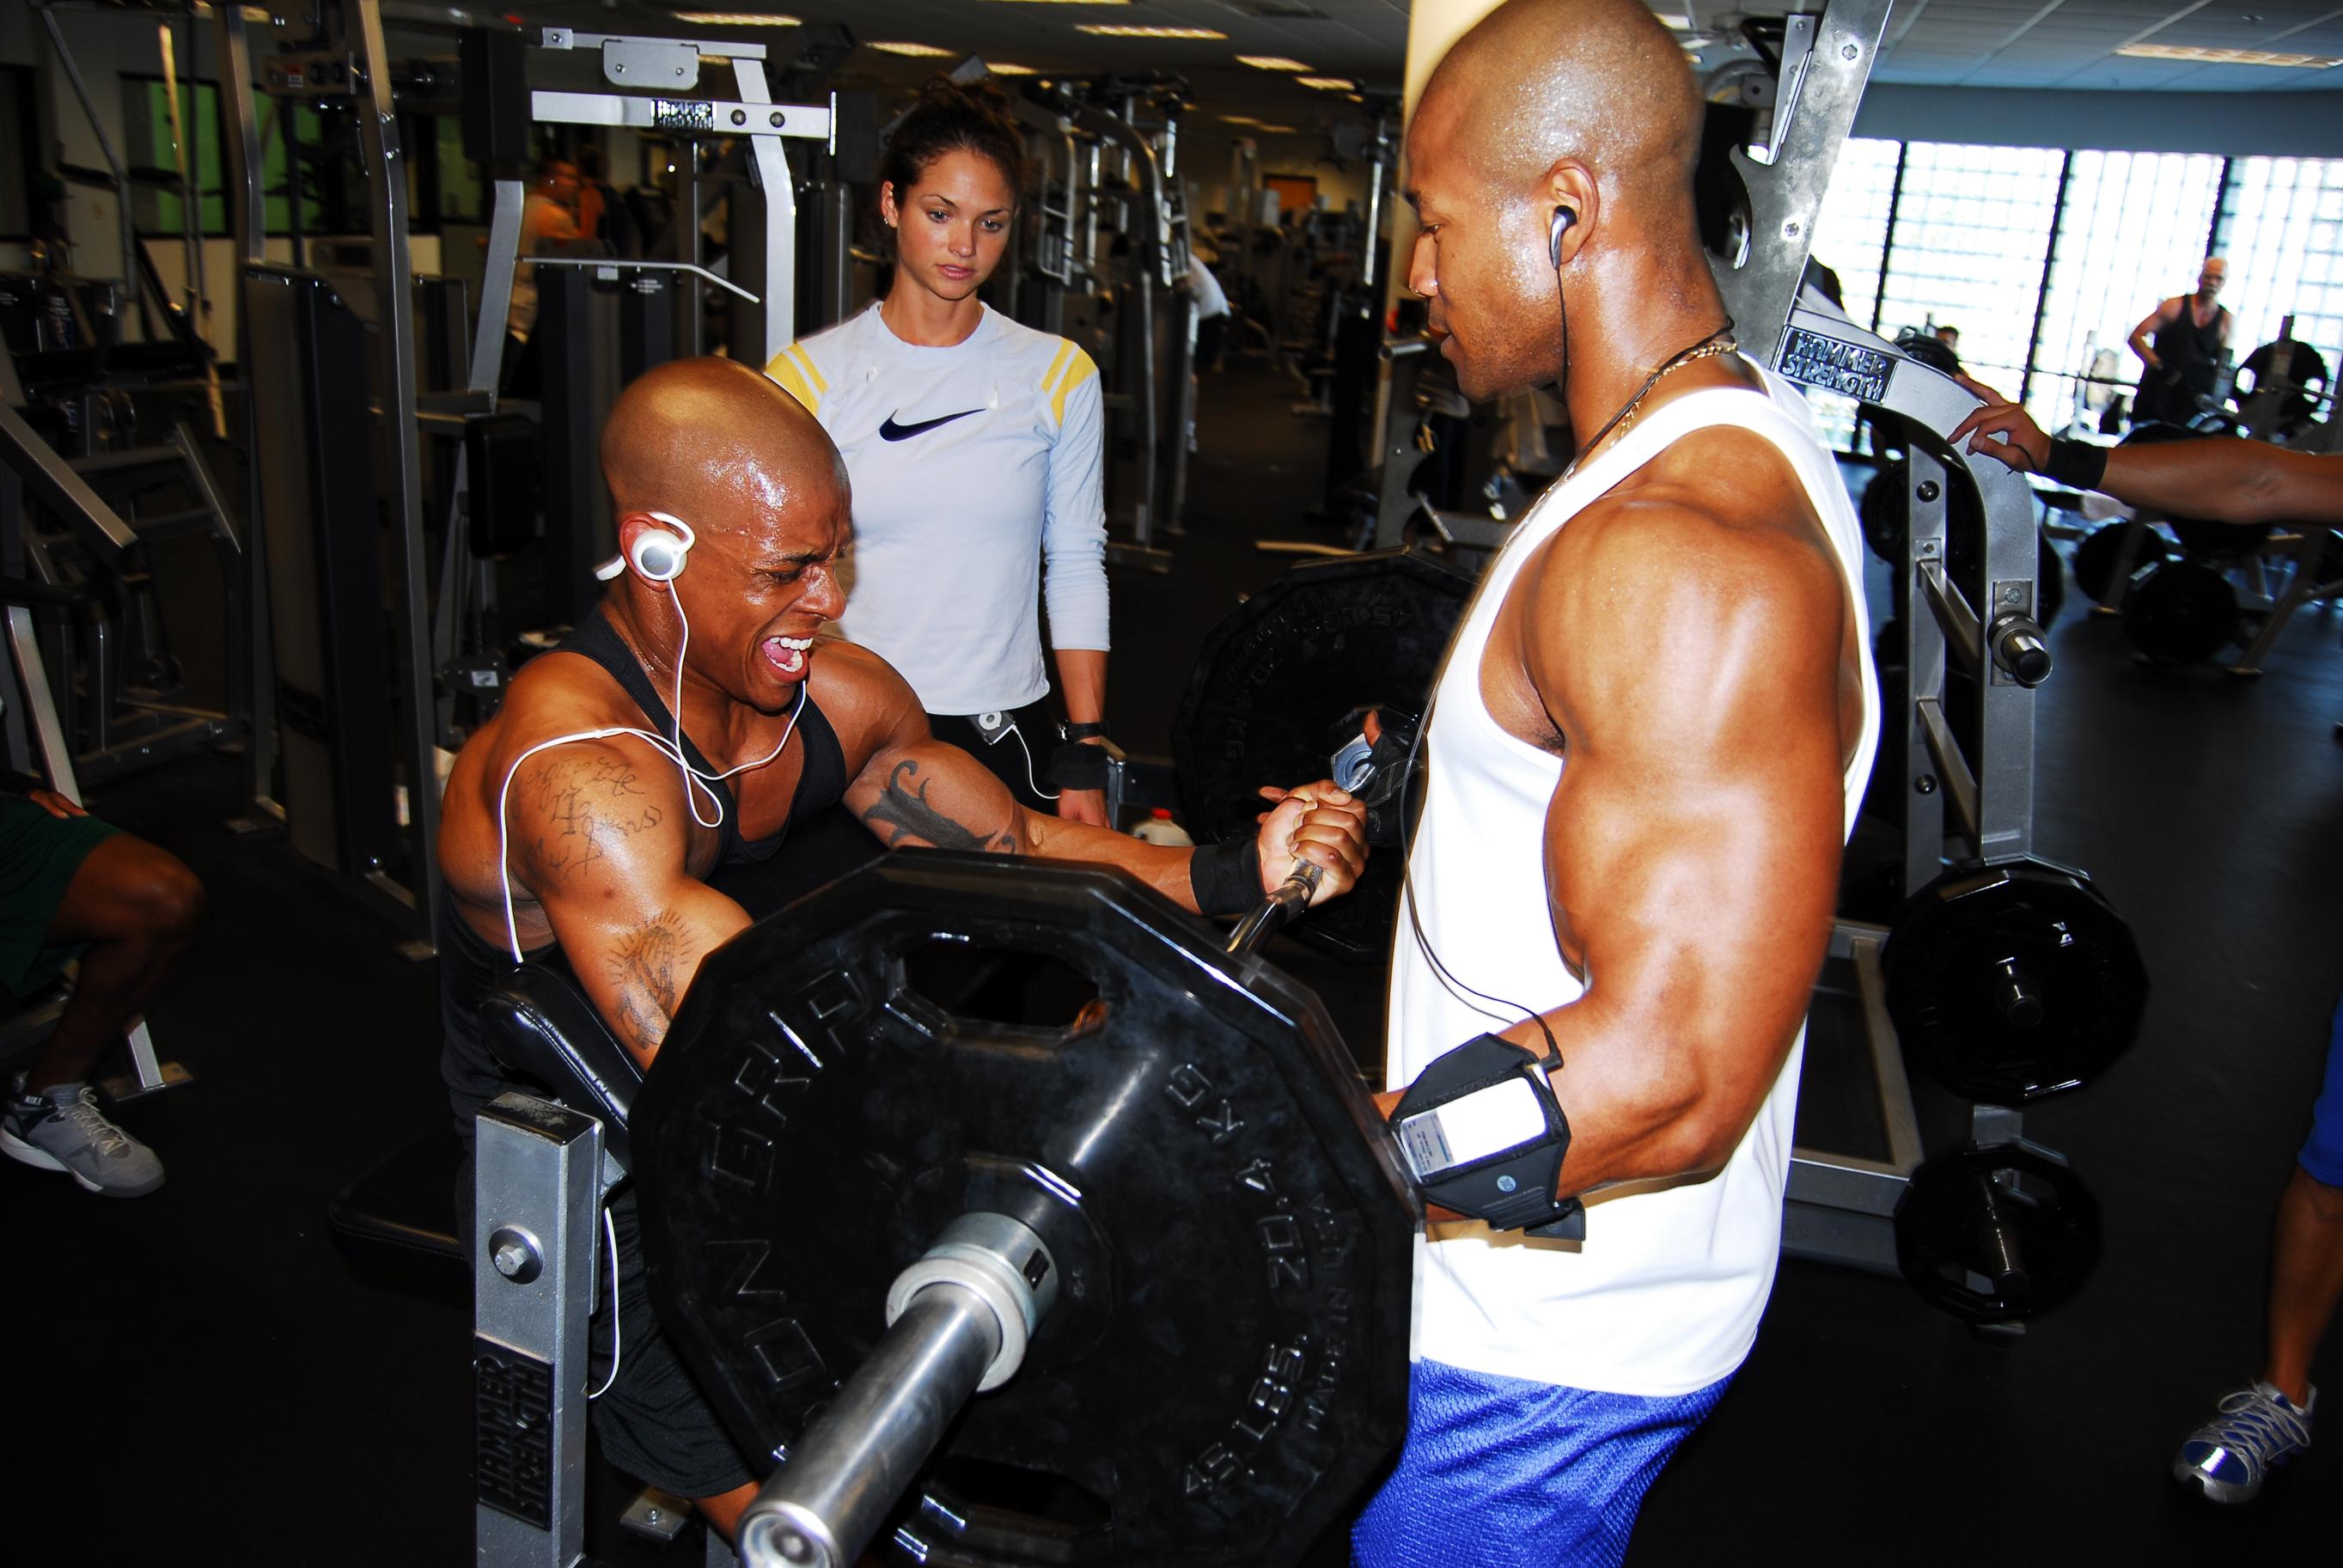 Get a Fitness Partner!